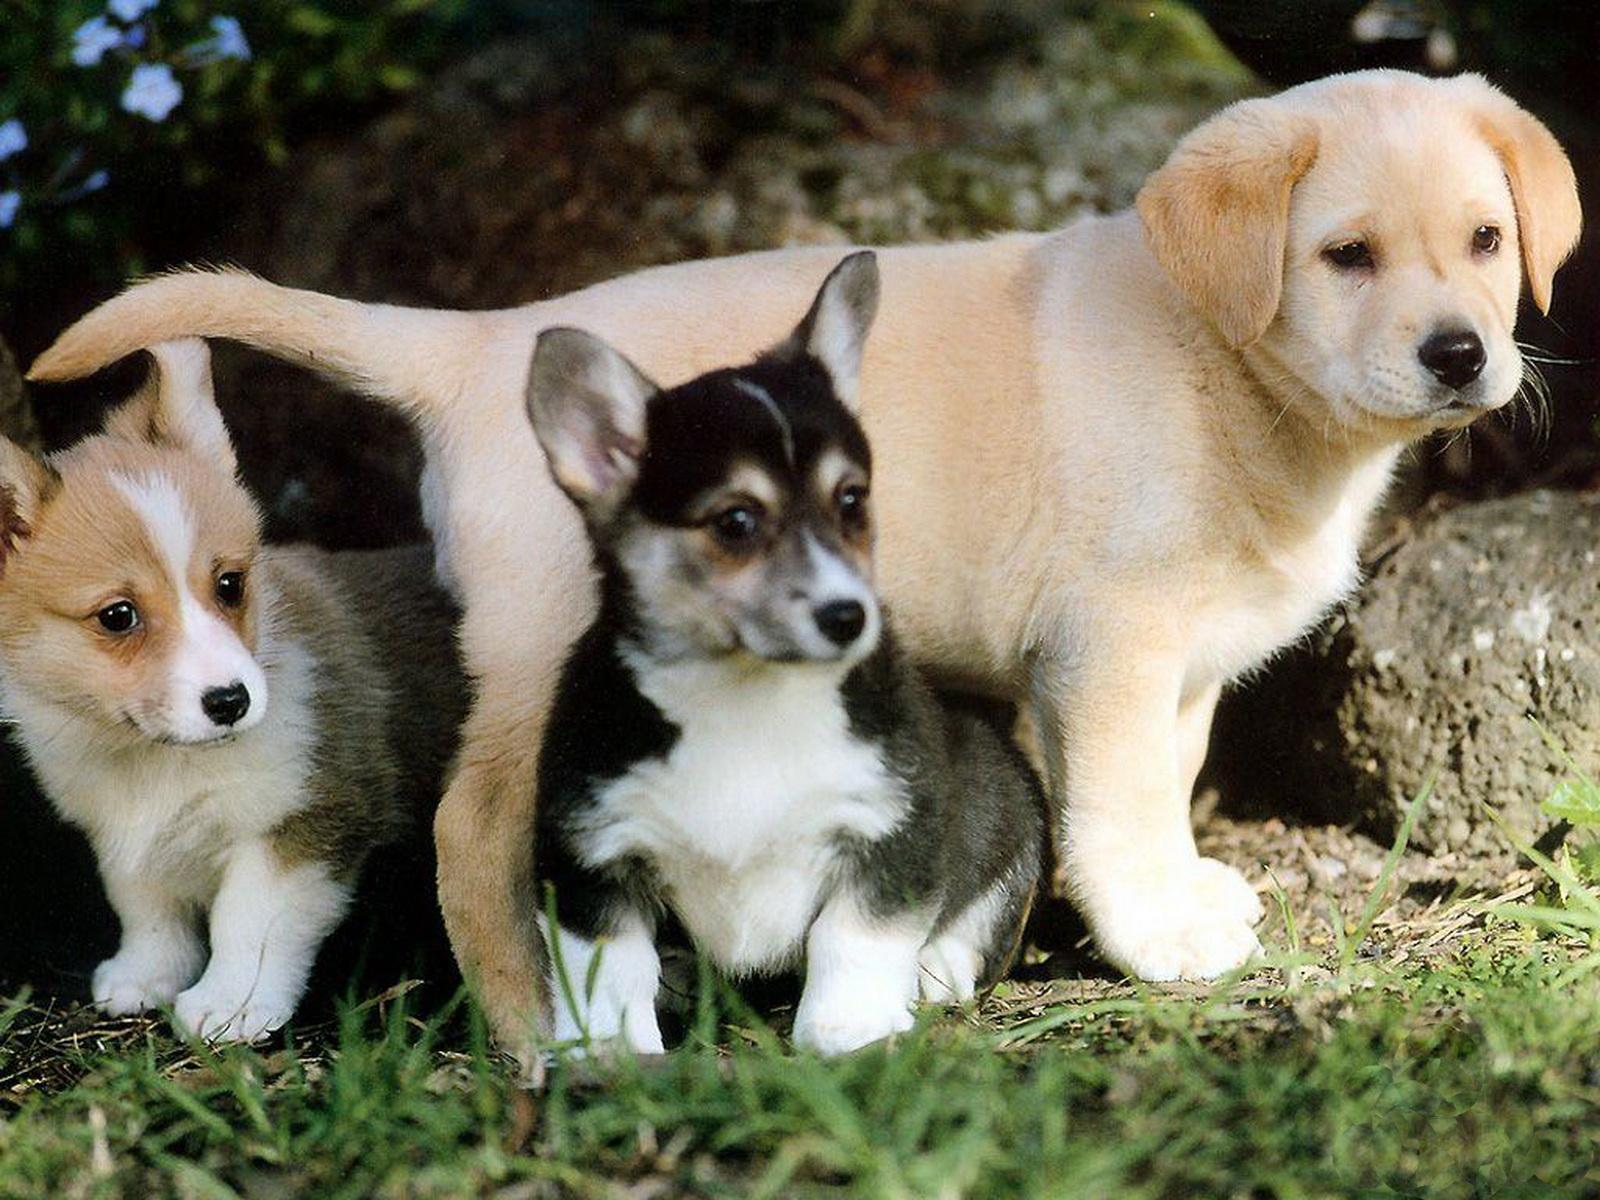 http://4.bp.blogspot.com/-BvqxyjKqDvI/Tyw827PPorI/AAAAAAAAA3c/VtkYeDsbplo/s1600/23-Cute+Dog+1600x1200.jpg